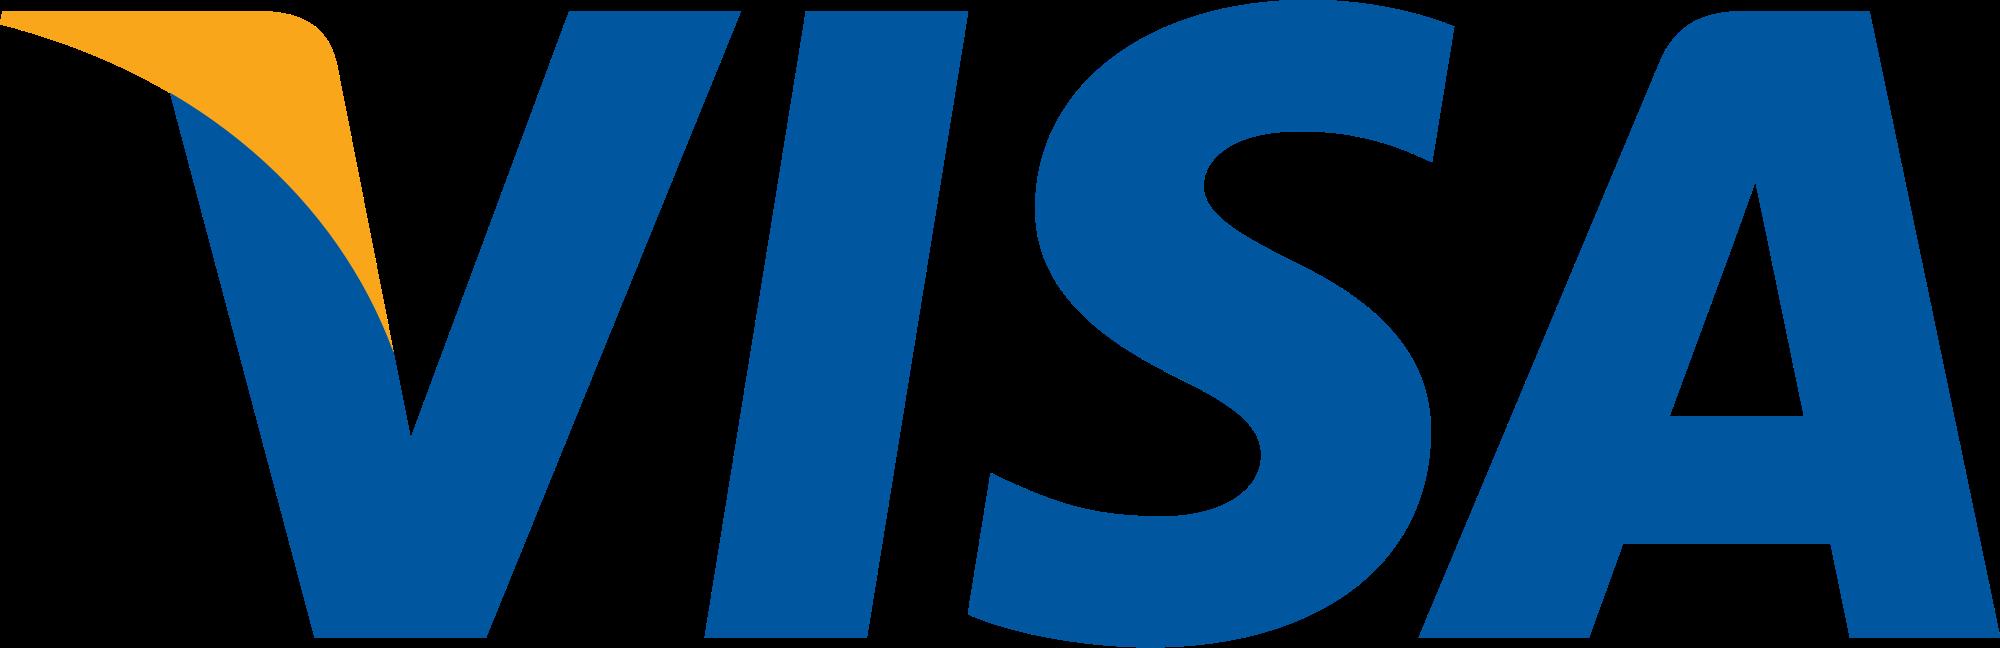 Kreditkartenzahlung VISA